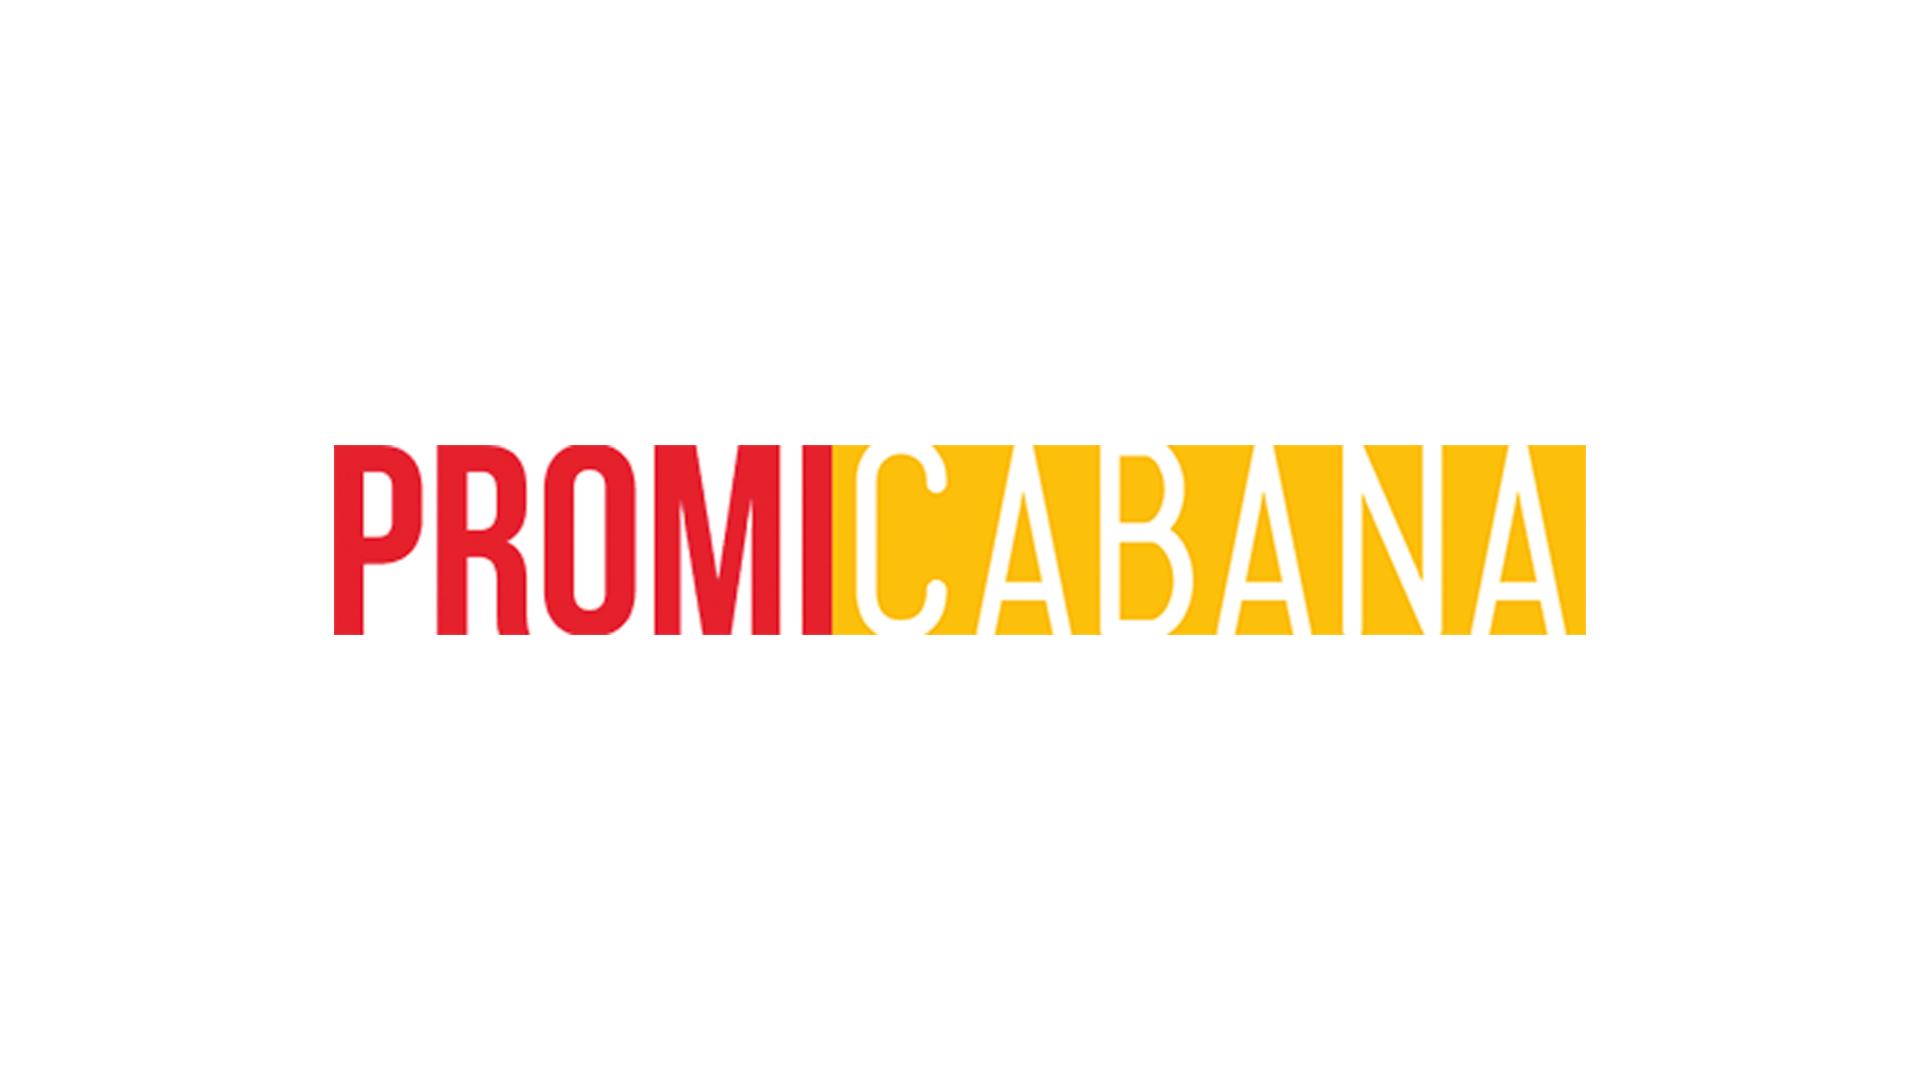 Promi-Big-Brother-Ronald-Schill-spannt-Badezimmer